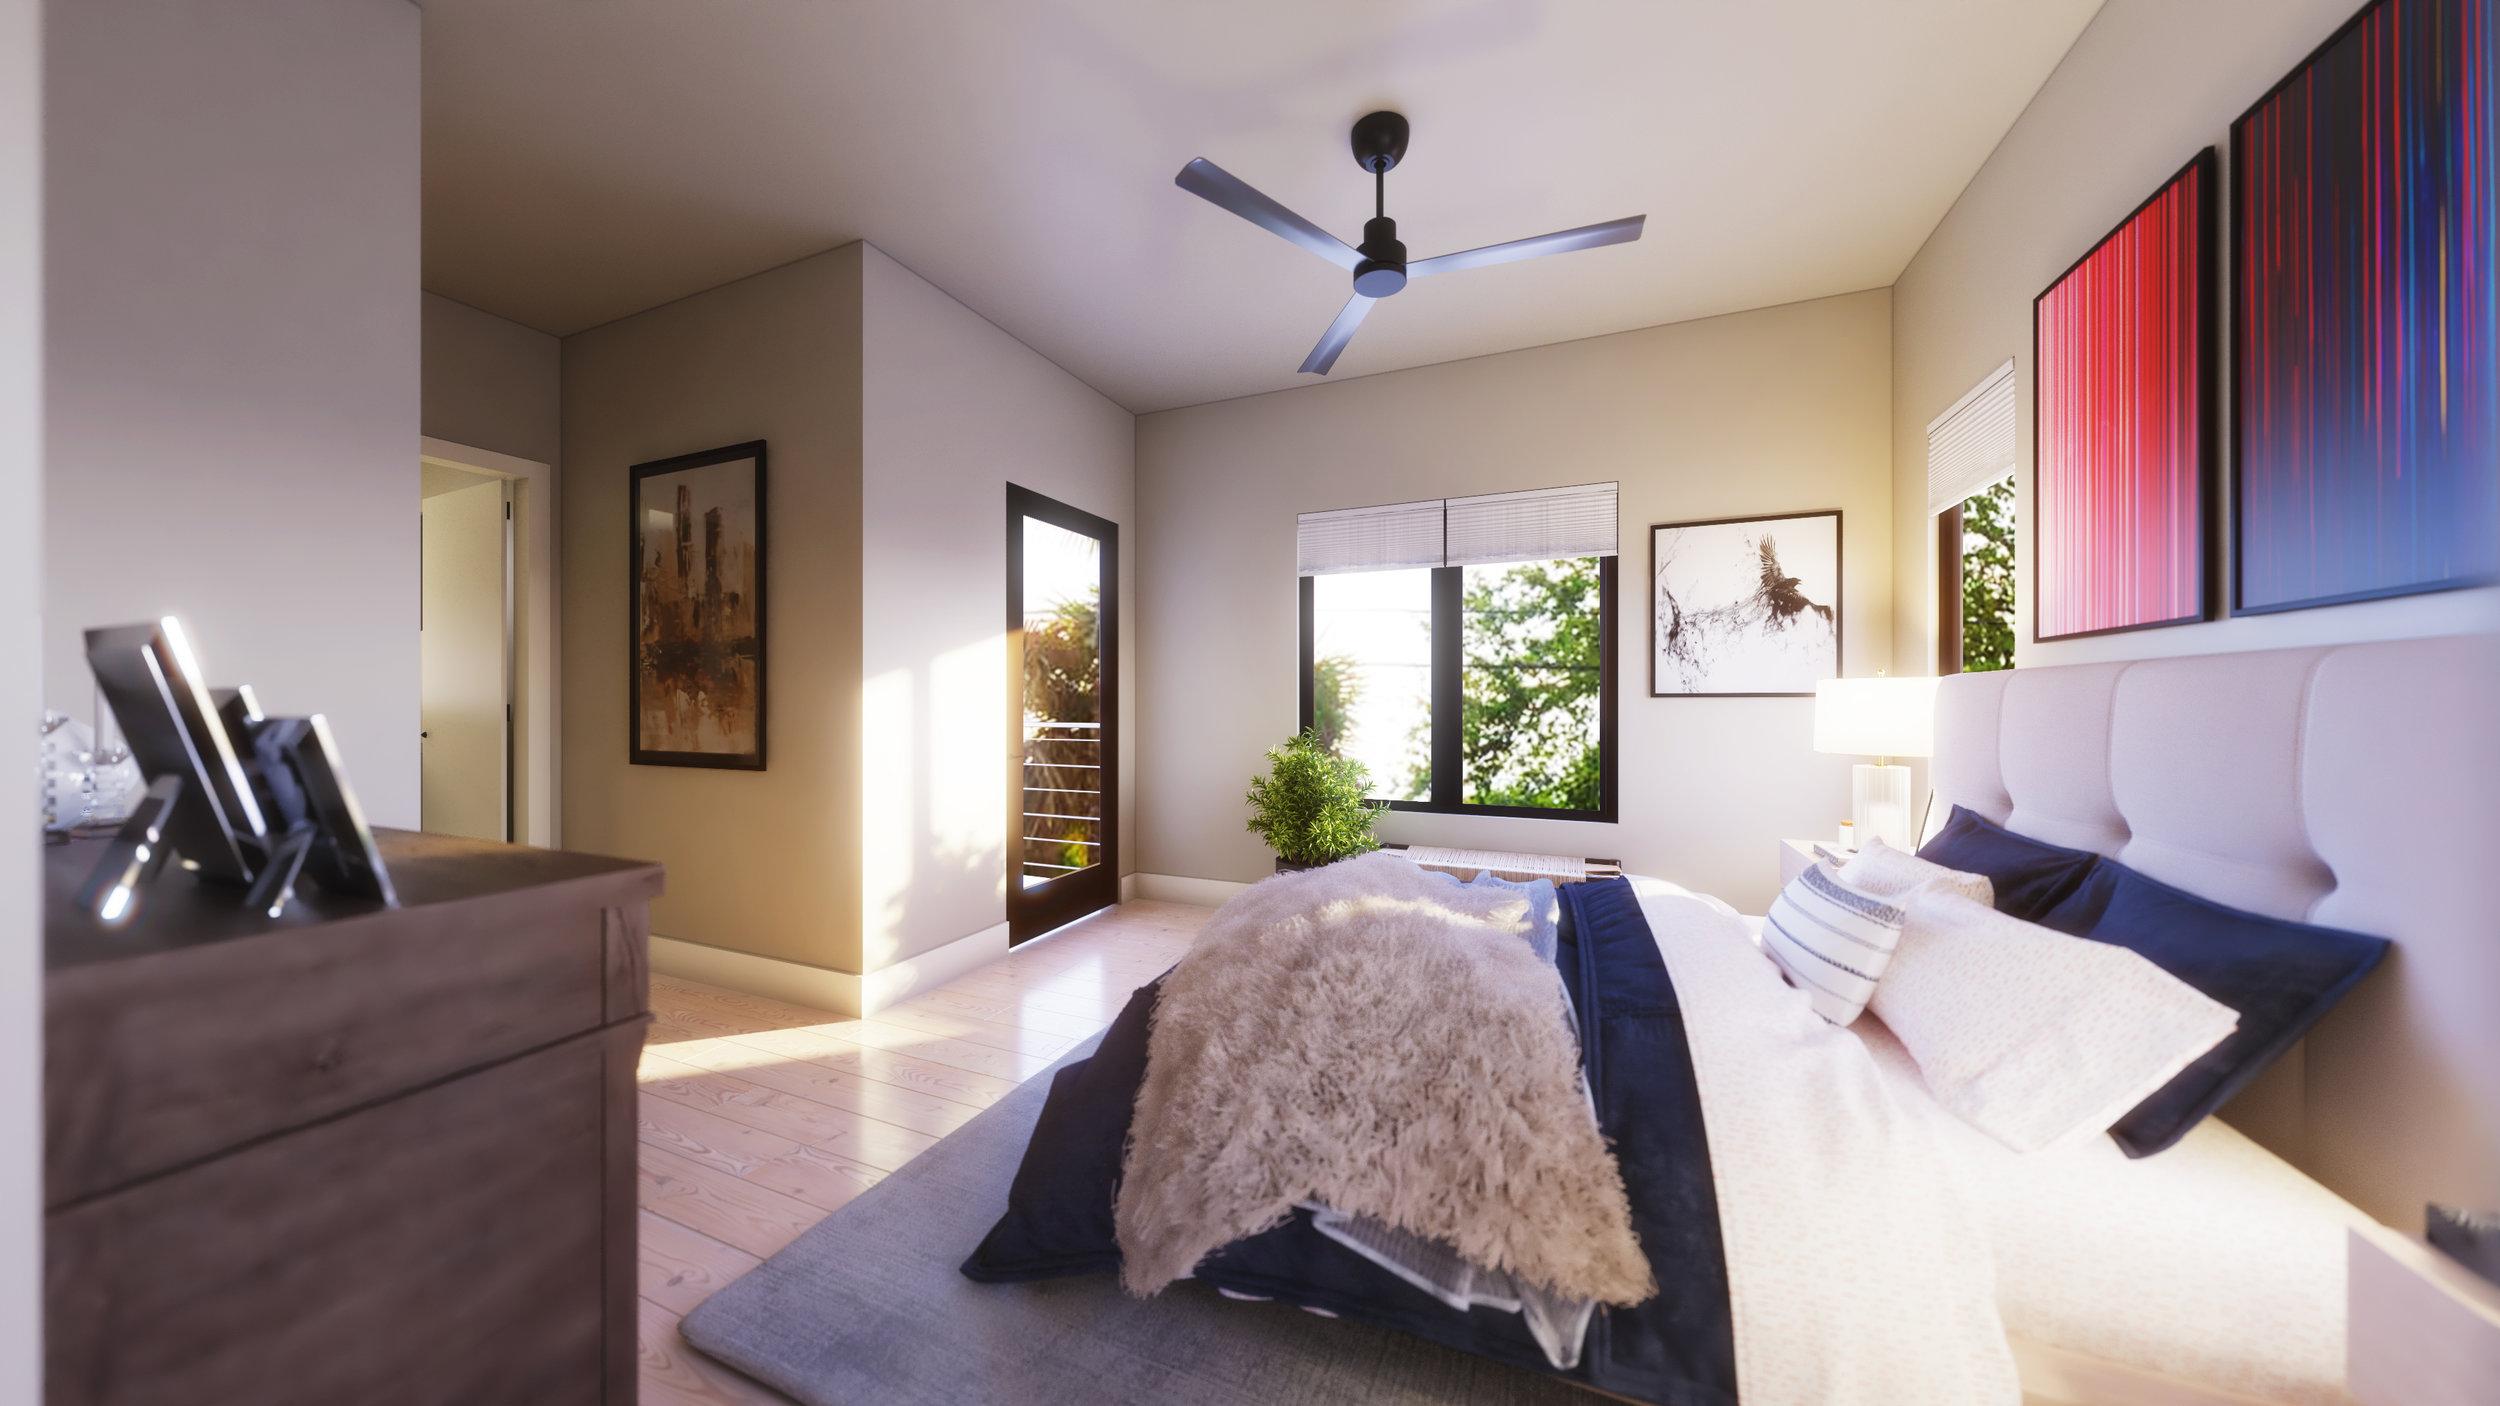 BA_Septima + Farmer_Town Homes_Master Bedroom_V1_04.jpg